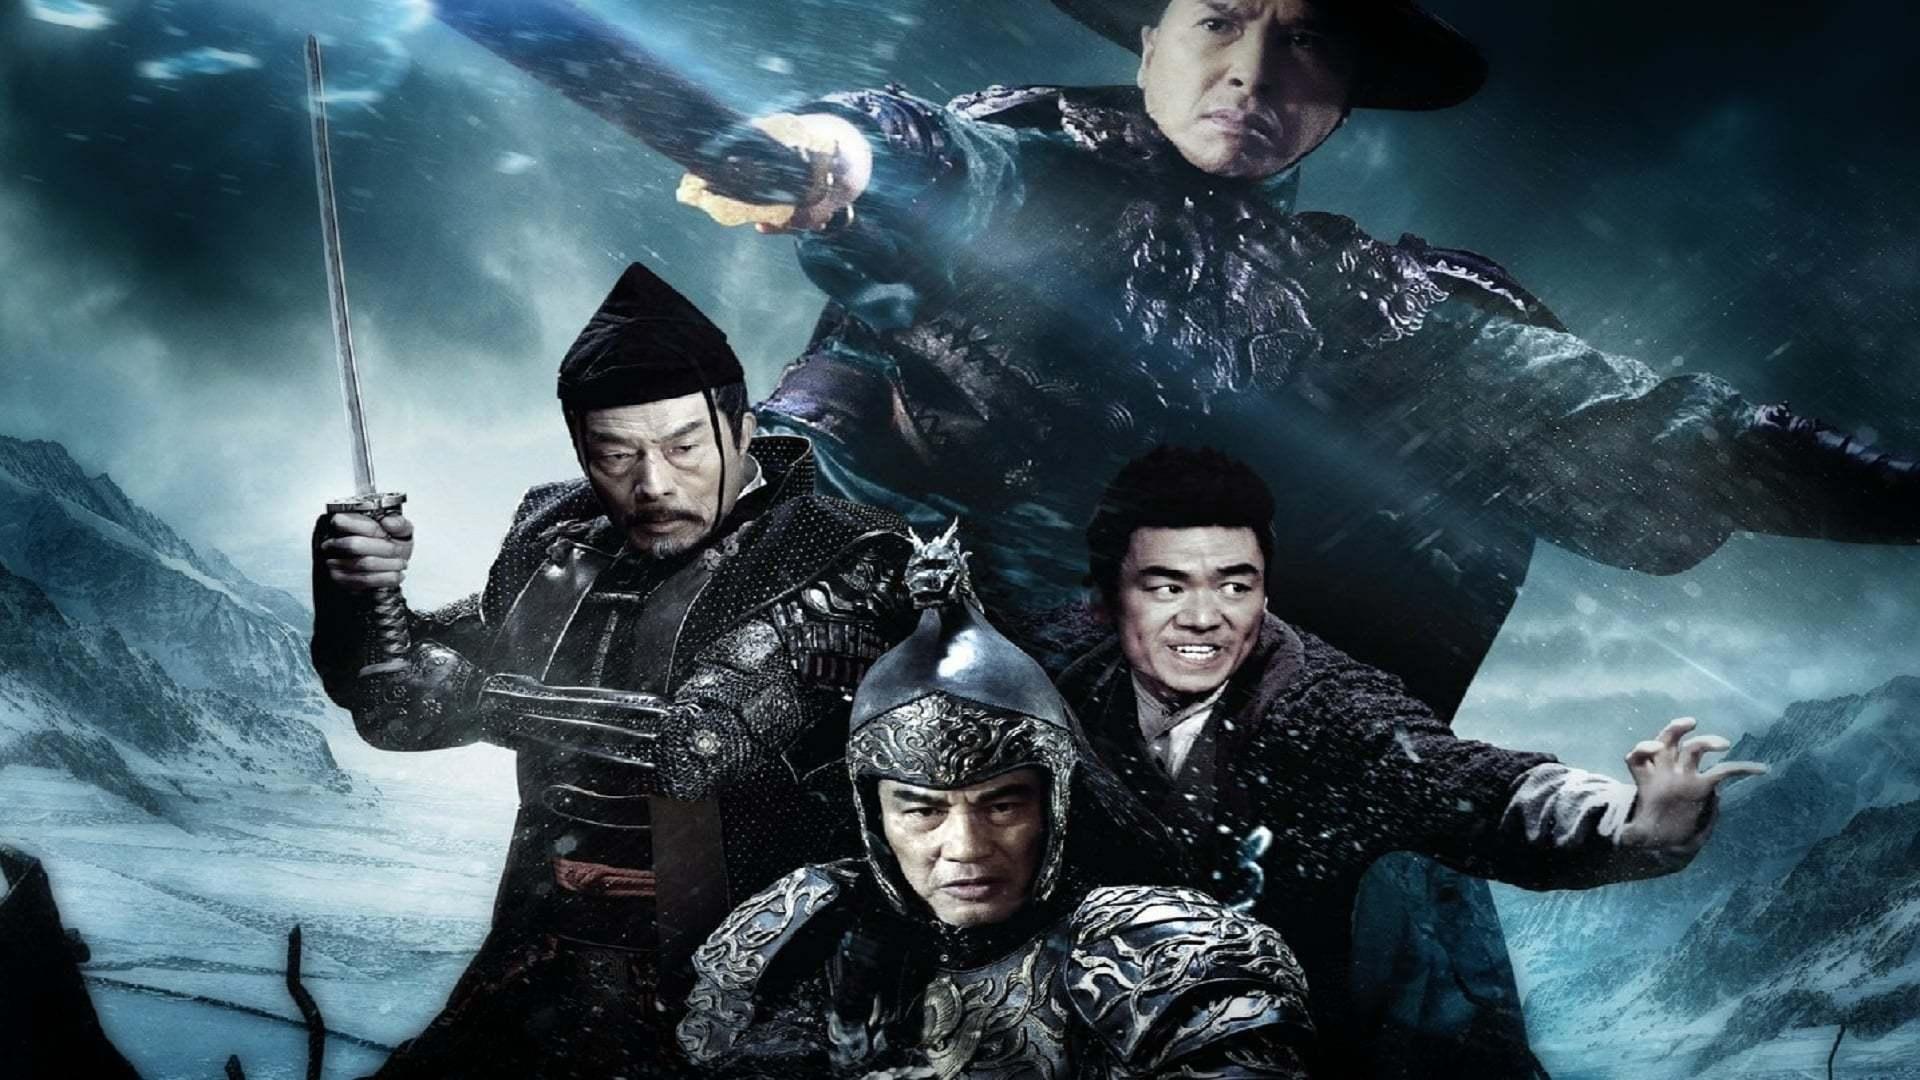 Кадры из фильма Ледяная комета 3D 2 Bing feng: Yong heng zhi men 2018